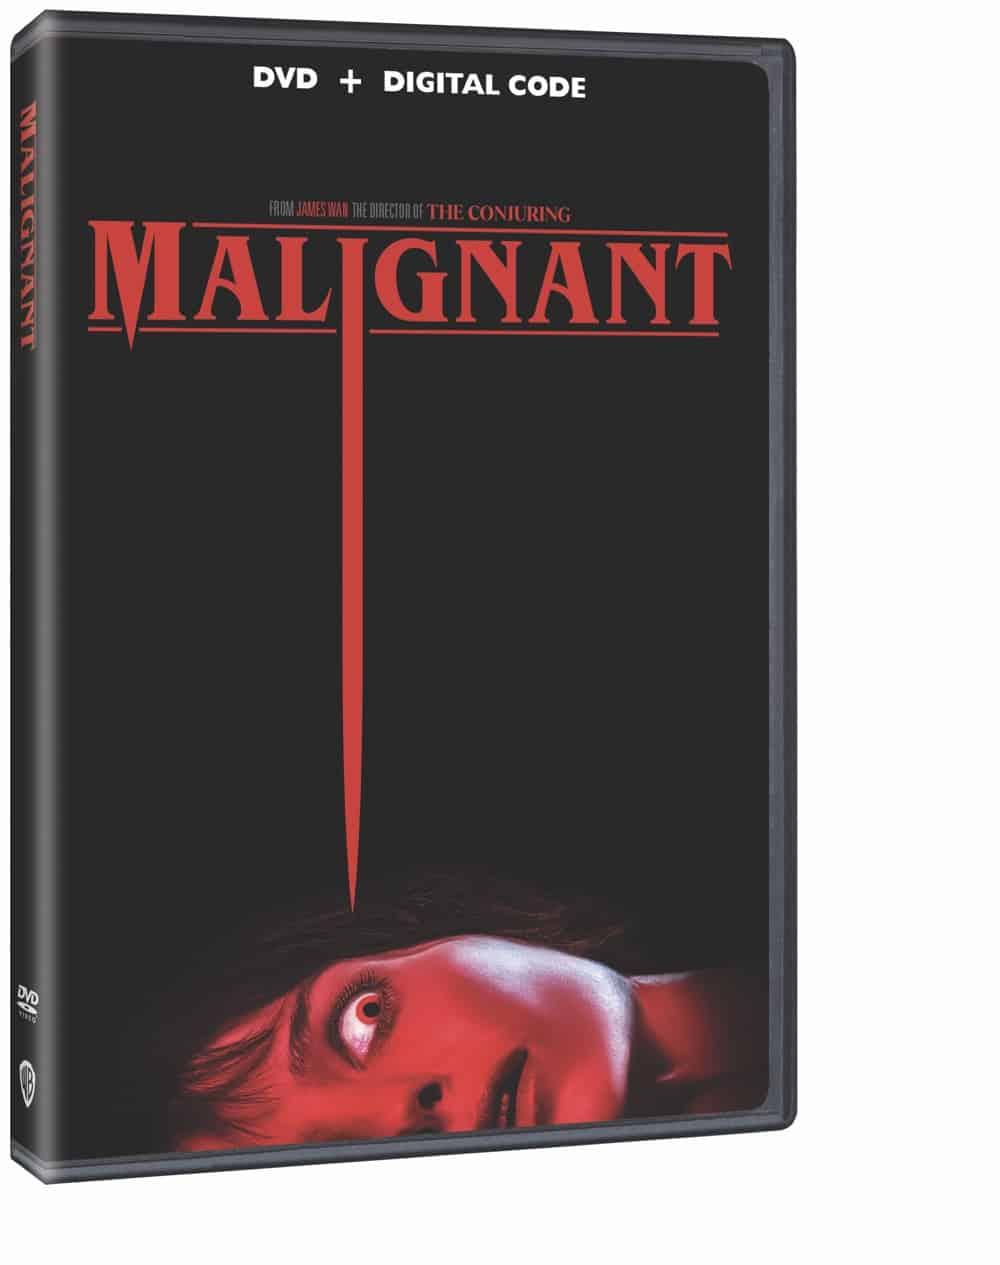 MALIGNANT WW DVDWRAP FINALSKEW 3D 1000757864